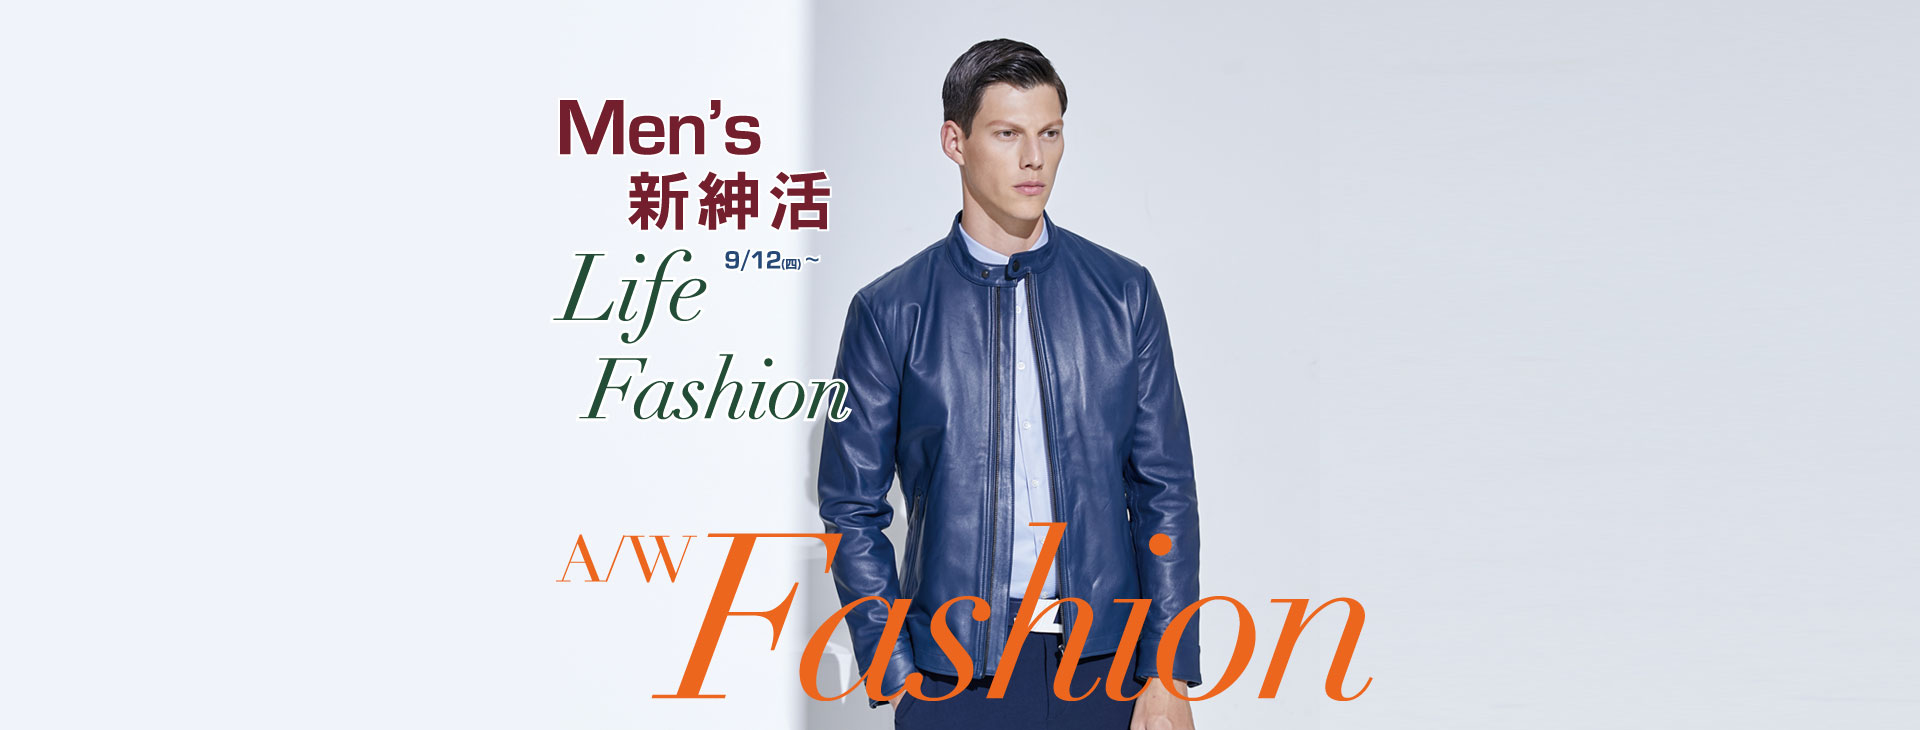 Men's 新紳活 Life Fashion